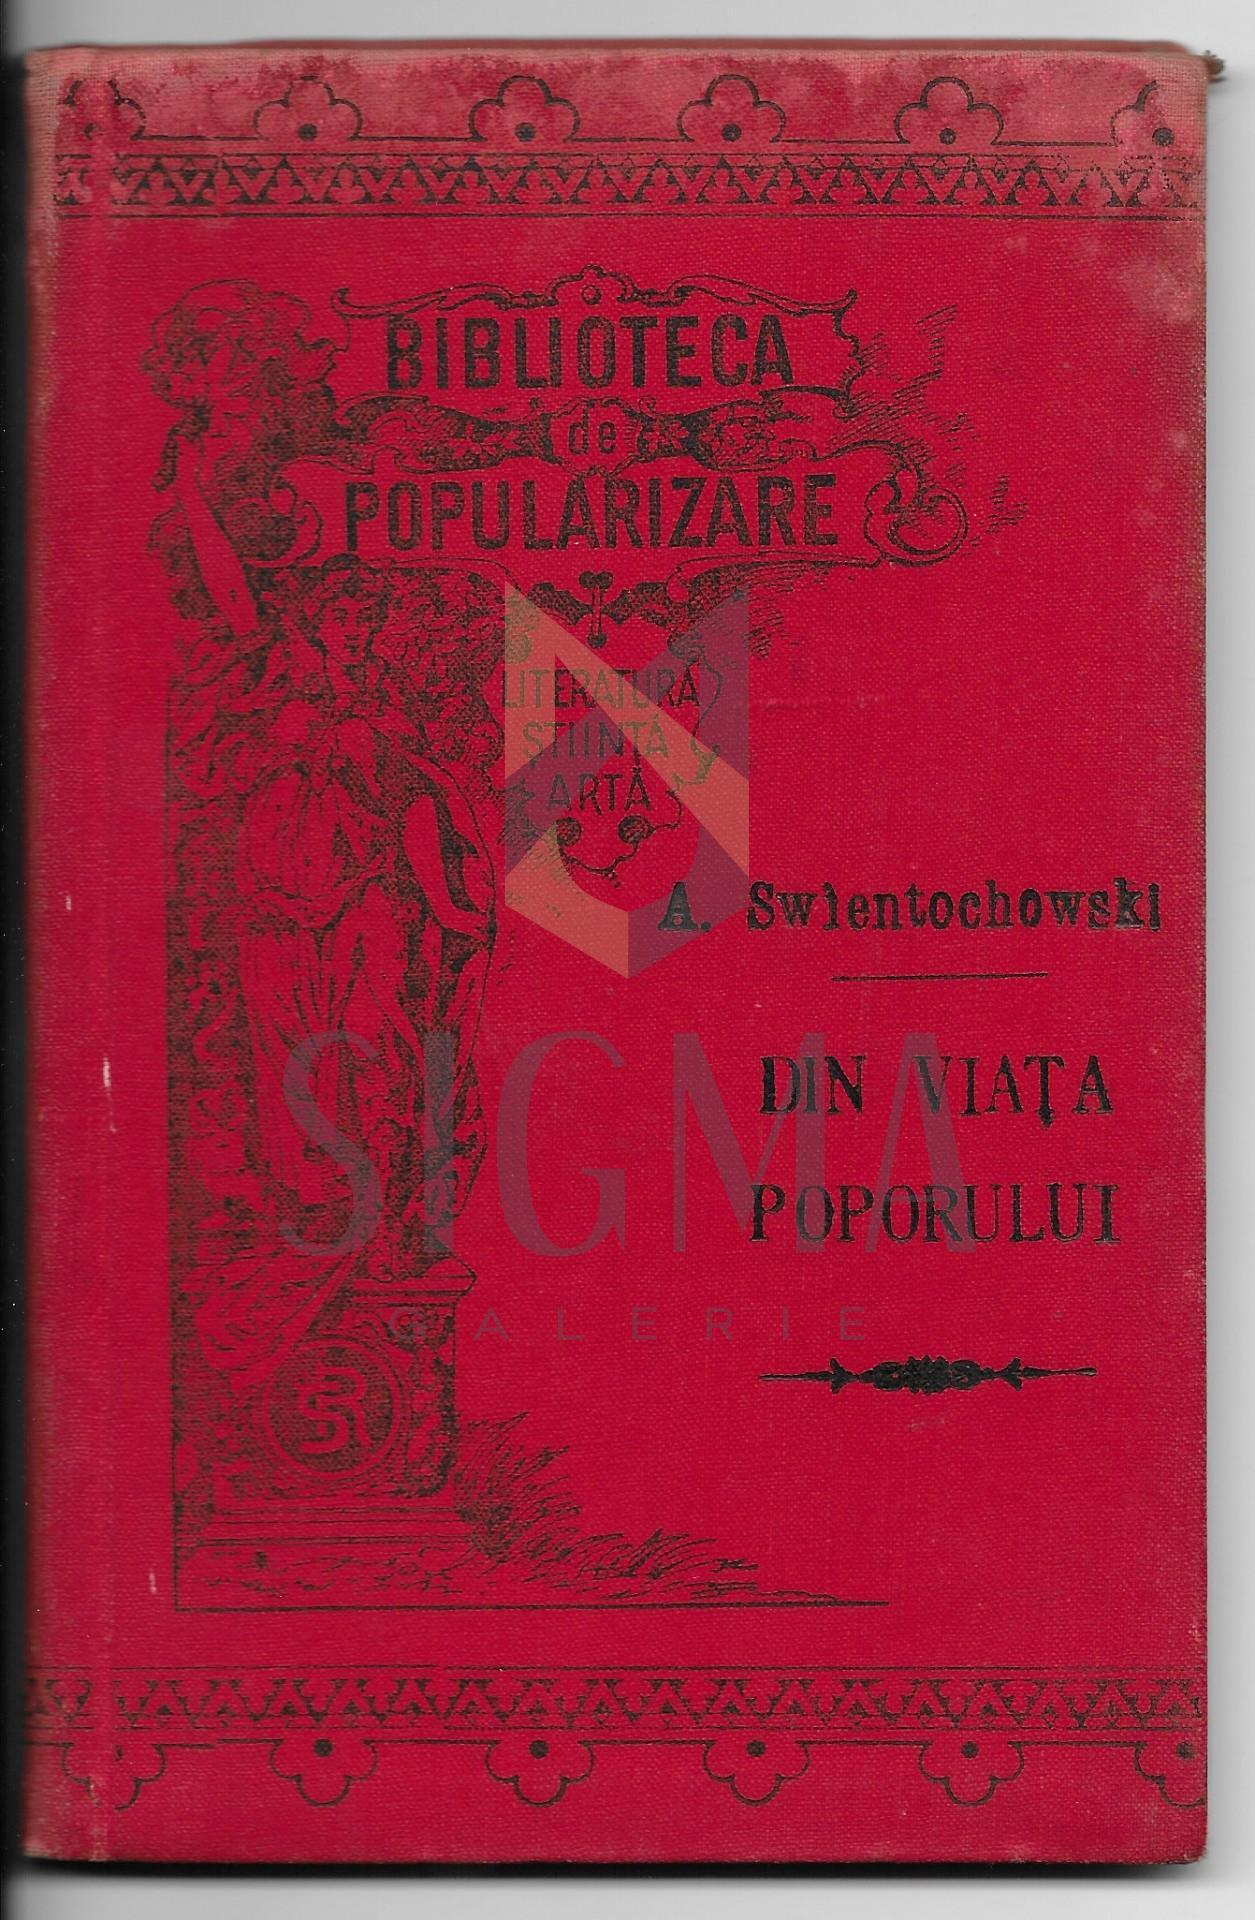 ALEX. SWIENTOCHOWSKI ( traducere de I. Hussar )